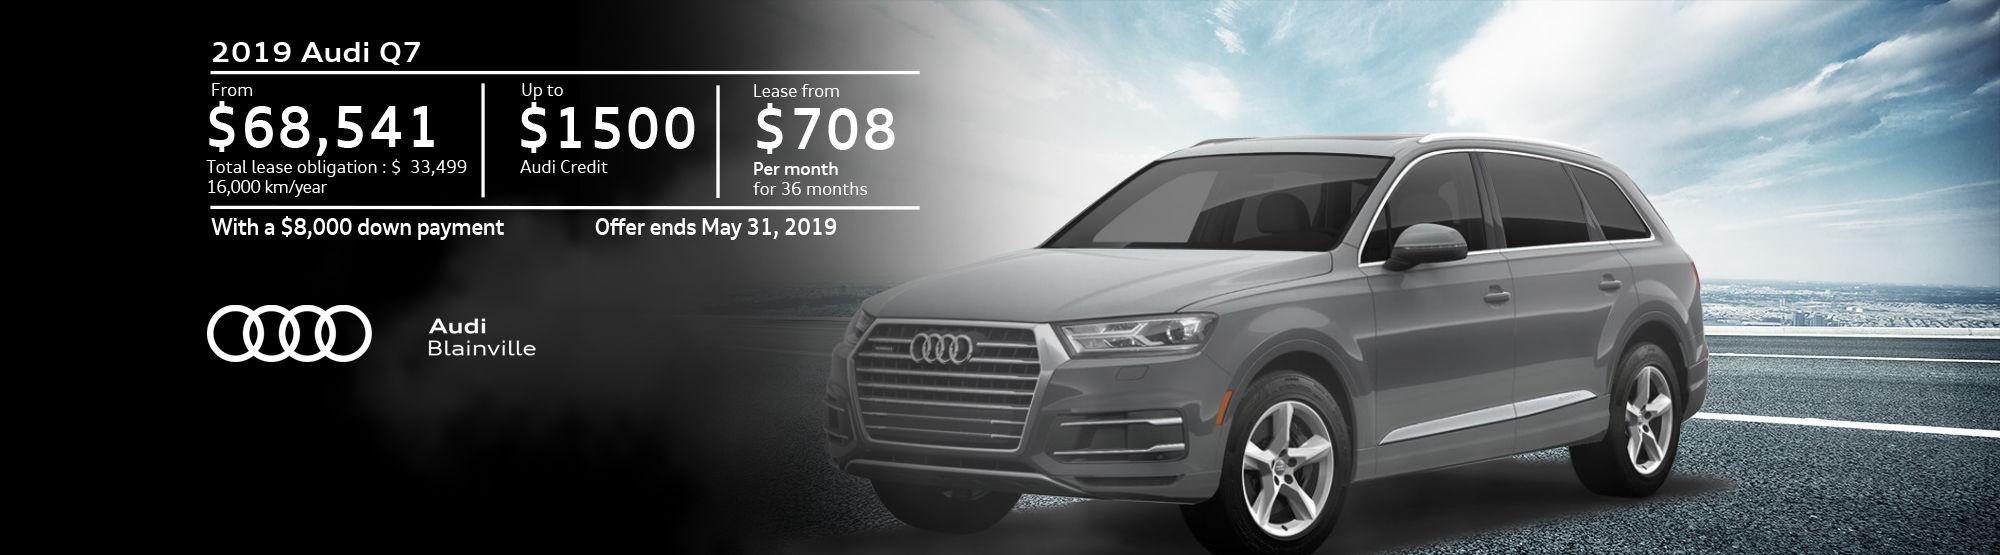 Audi Q7 May 2019